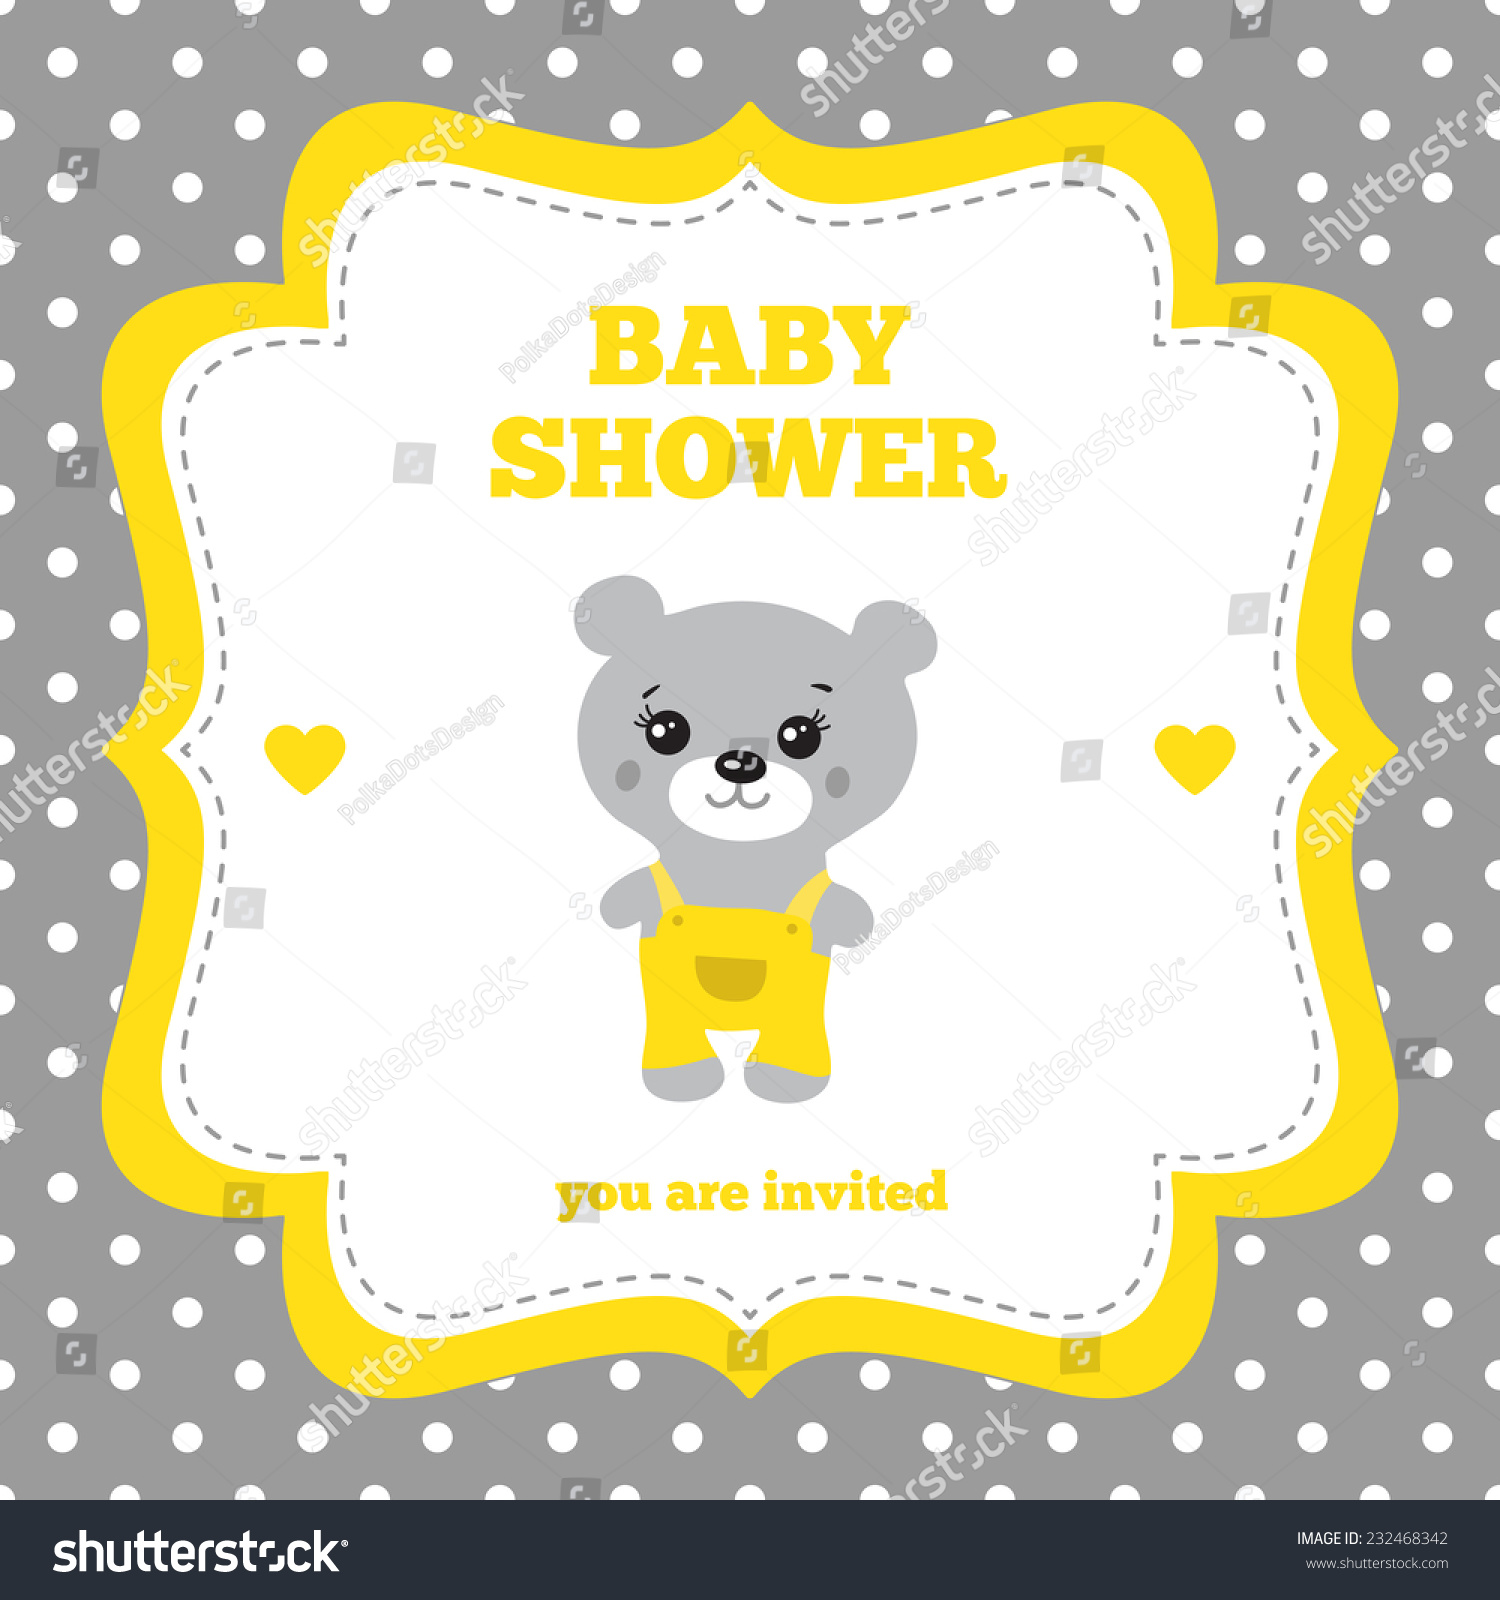 baby shower invitation template gray yellow stock vector, Baby shower